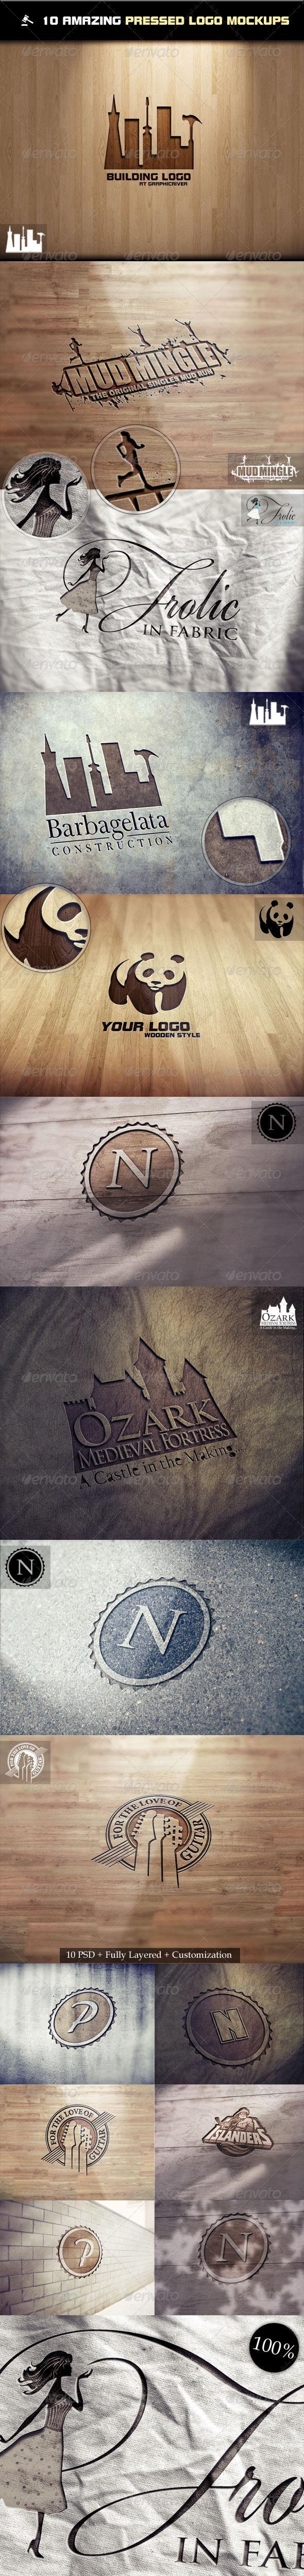 Graphics - 10 Amazing Pressed Logo Mock-Ups | GraphicRiver